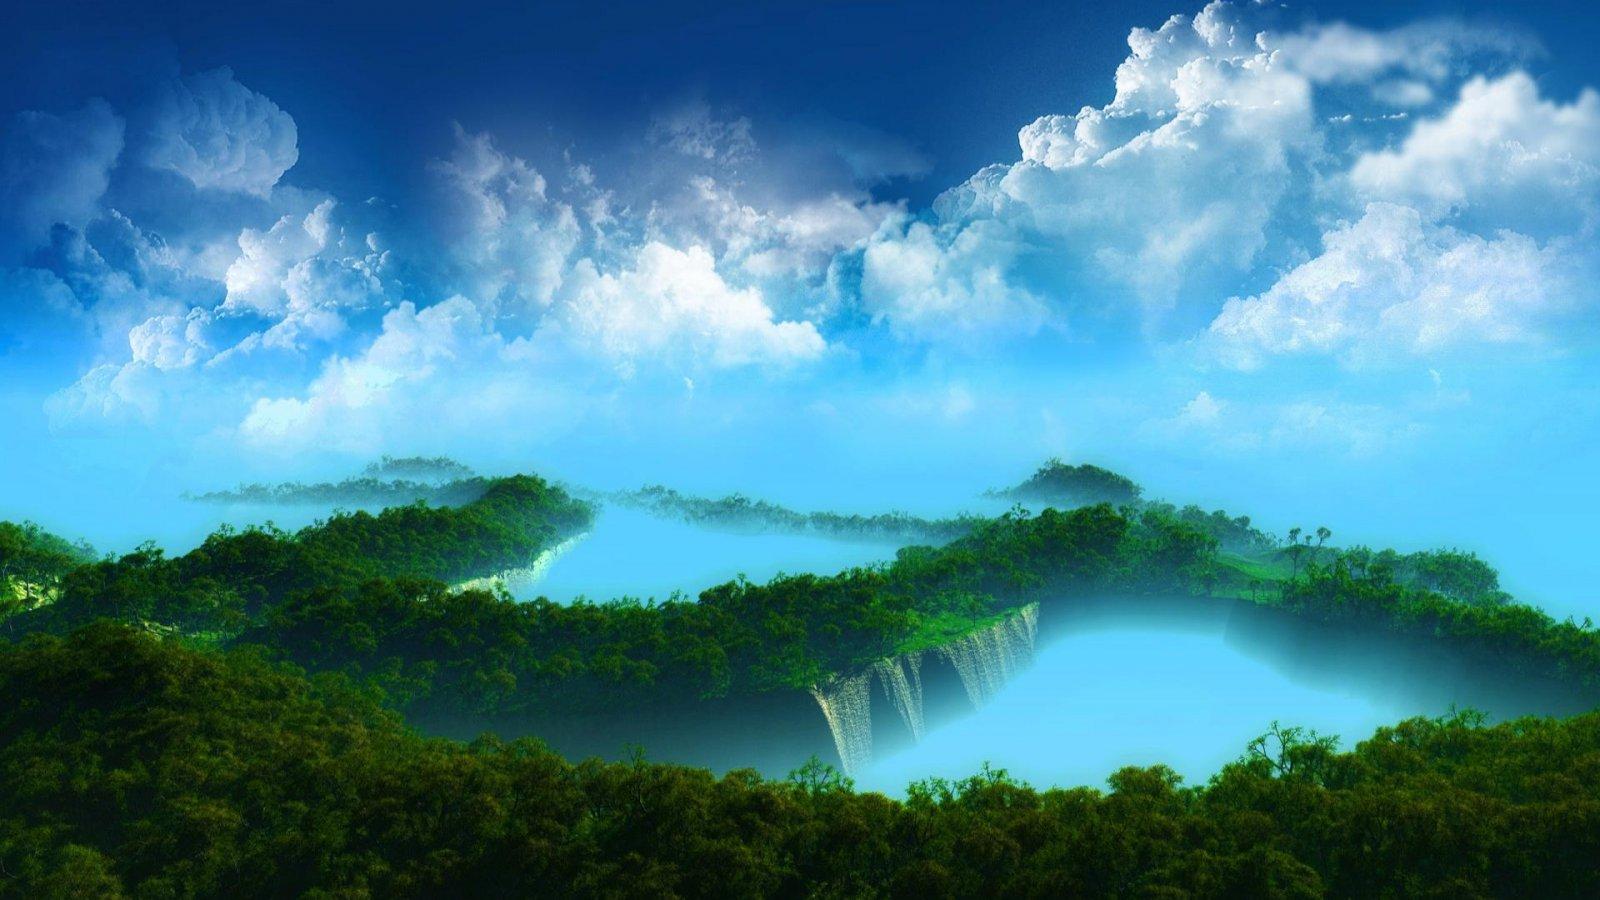 Beautiful waterfall desktop wallpaper 1600x900 hd Nature wallpaper 1600x900